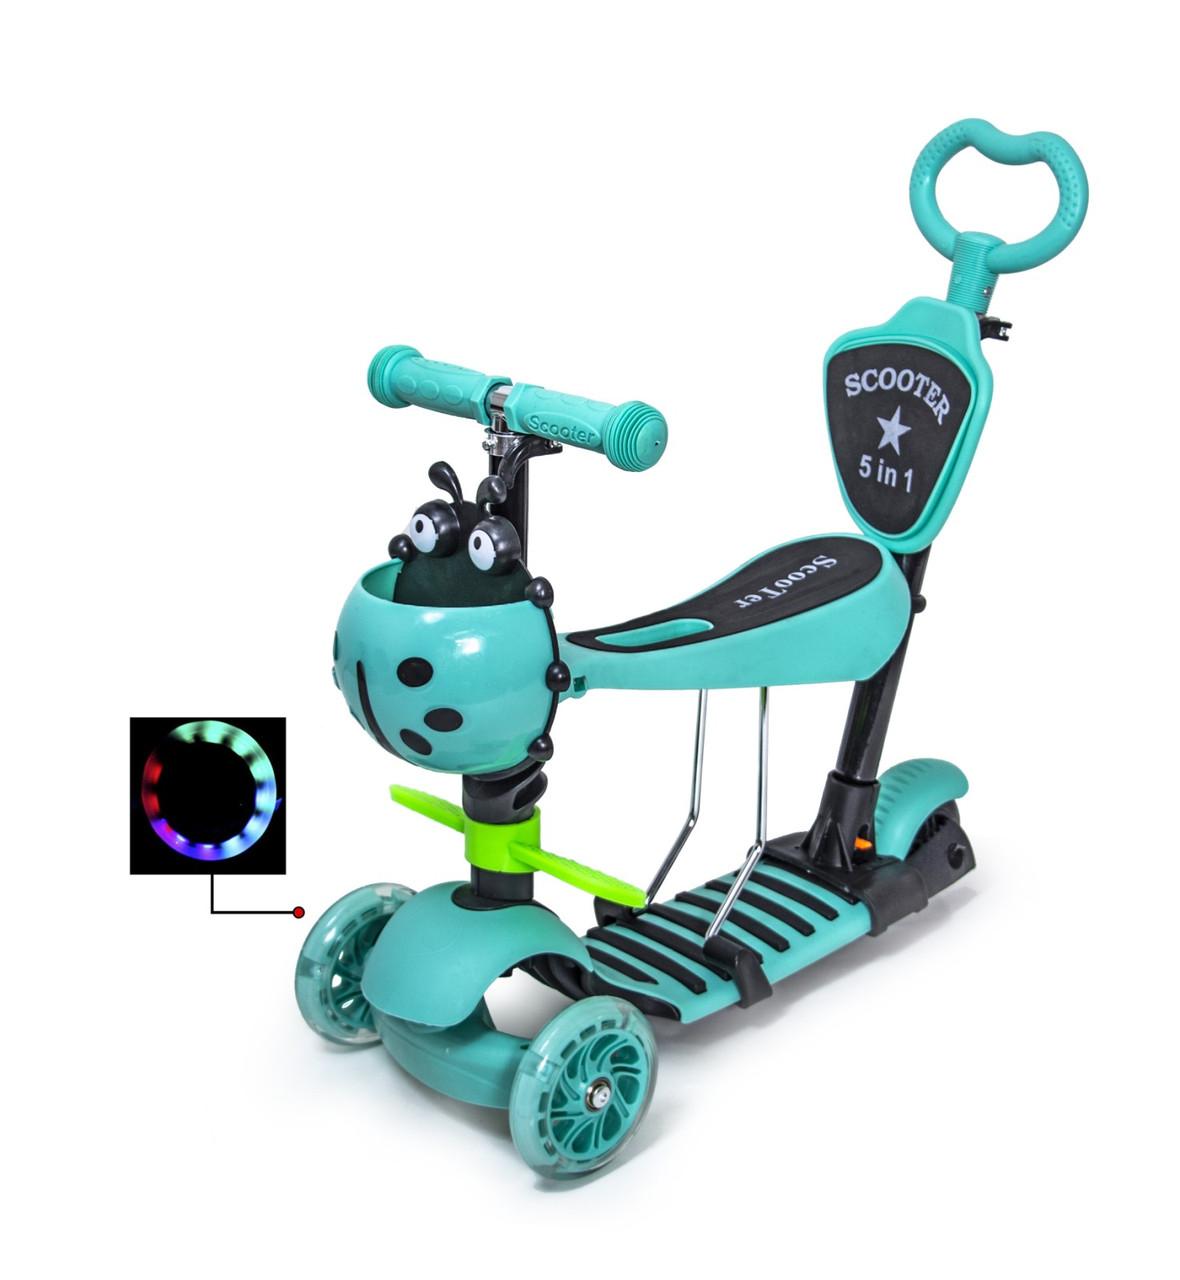 "Самокат Scooter ""Божа корівка"" 5in1 Tiffany"